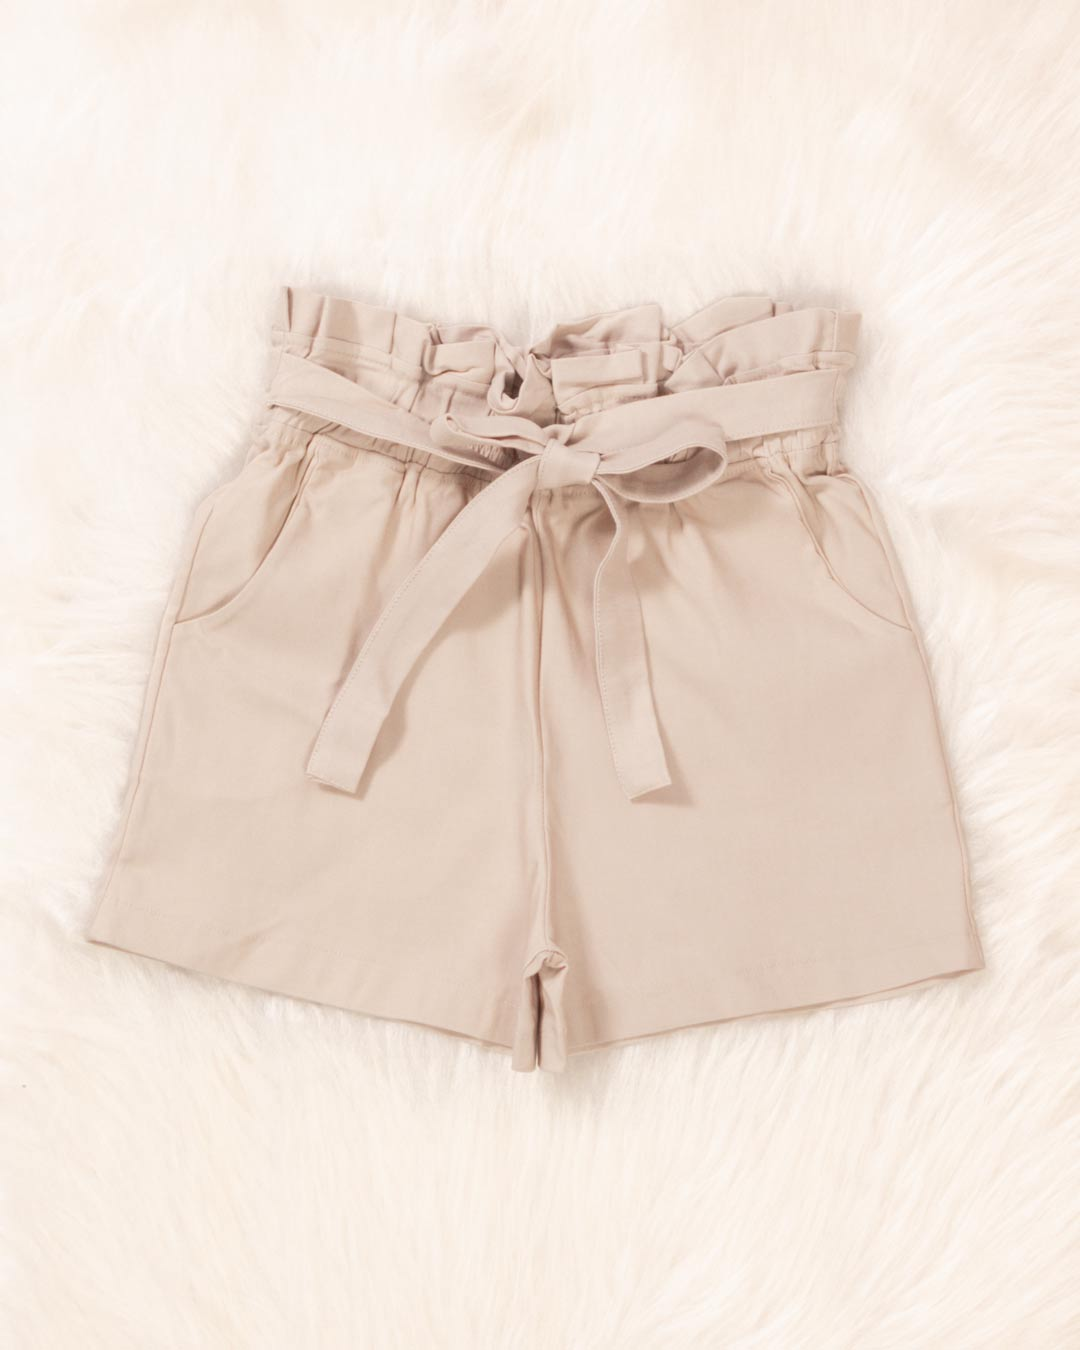 Shorts Adulto Básico Com Elástico - The Moment